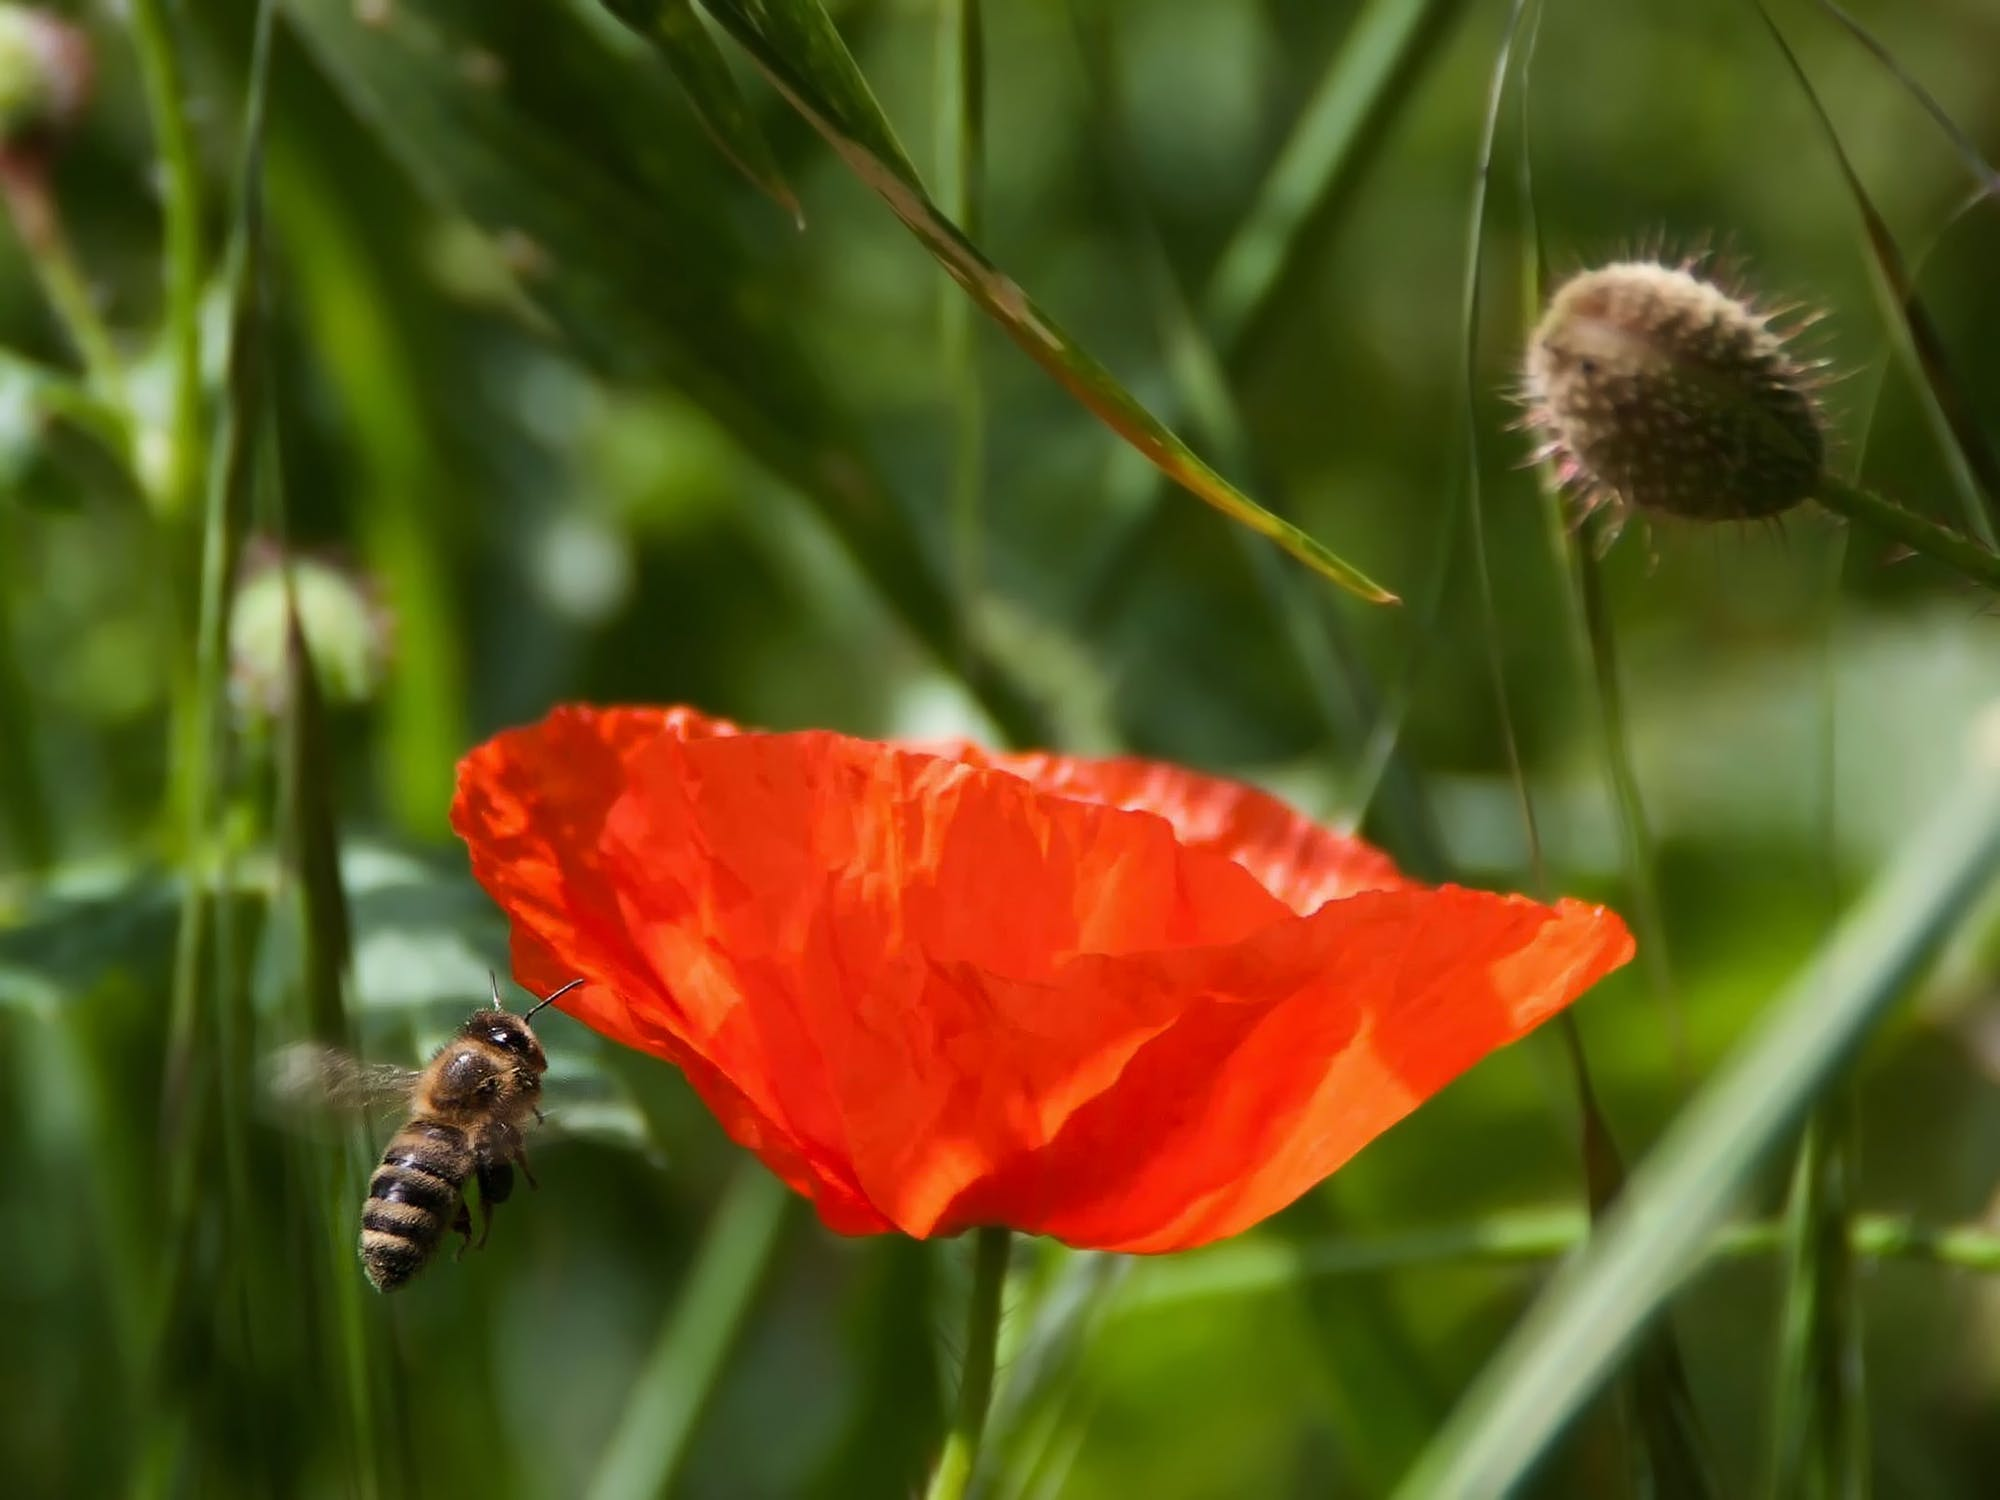 Brown and Black Bee Flying Near Orange Petaled Flower during Daytime